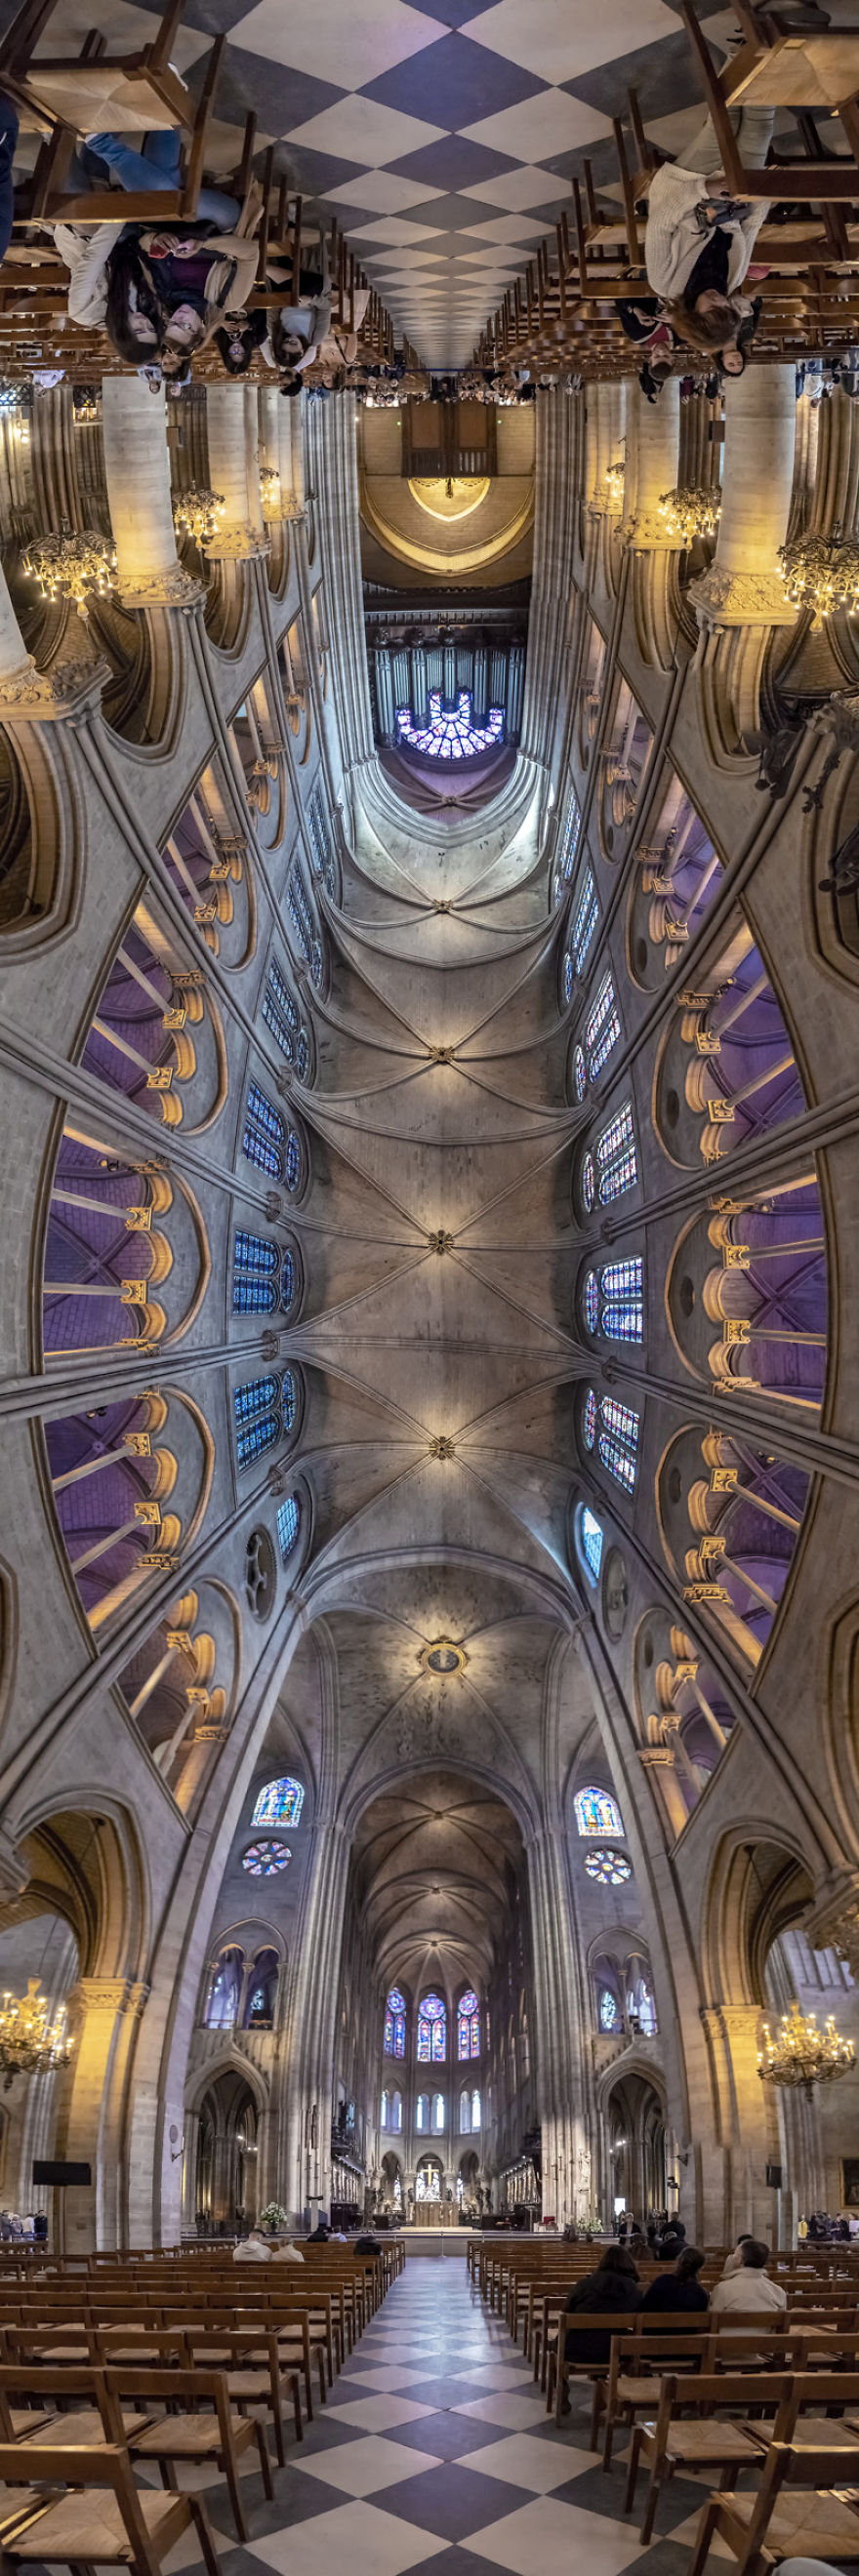 Cathedral-Notre-Dame-Paris-France-5afb3827b38dc__880